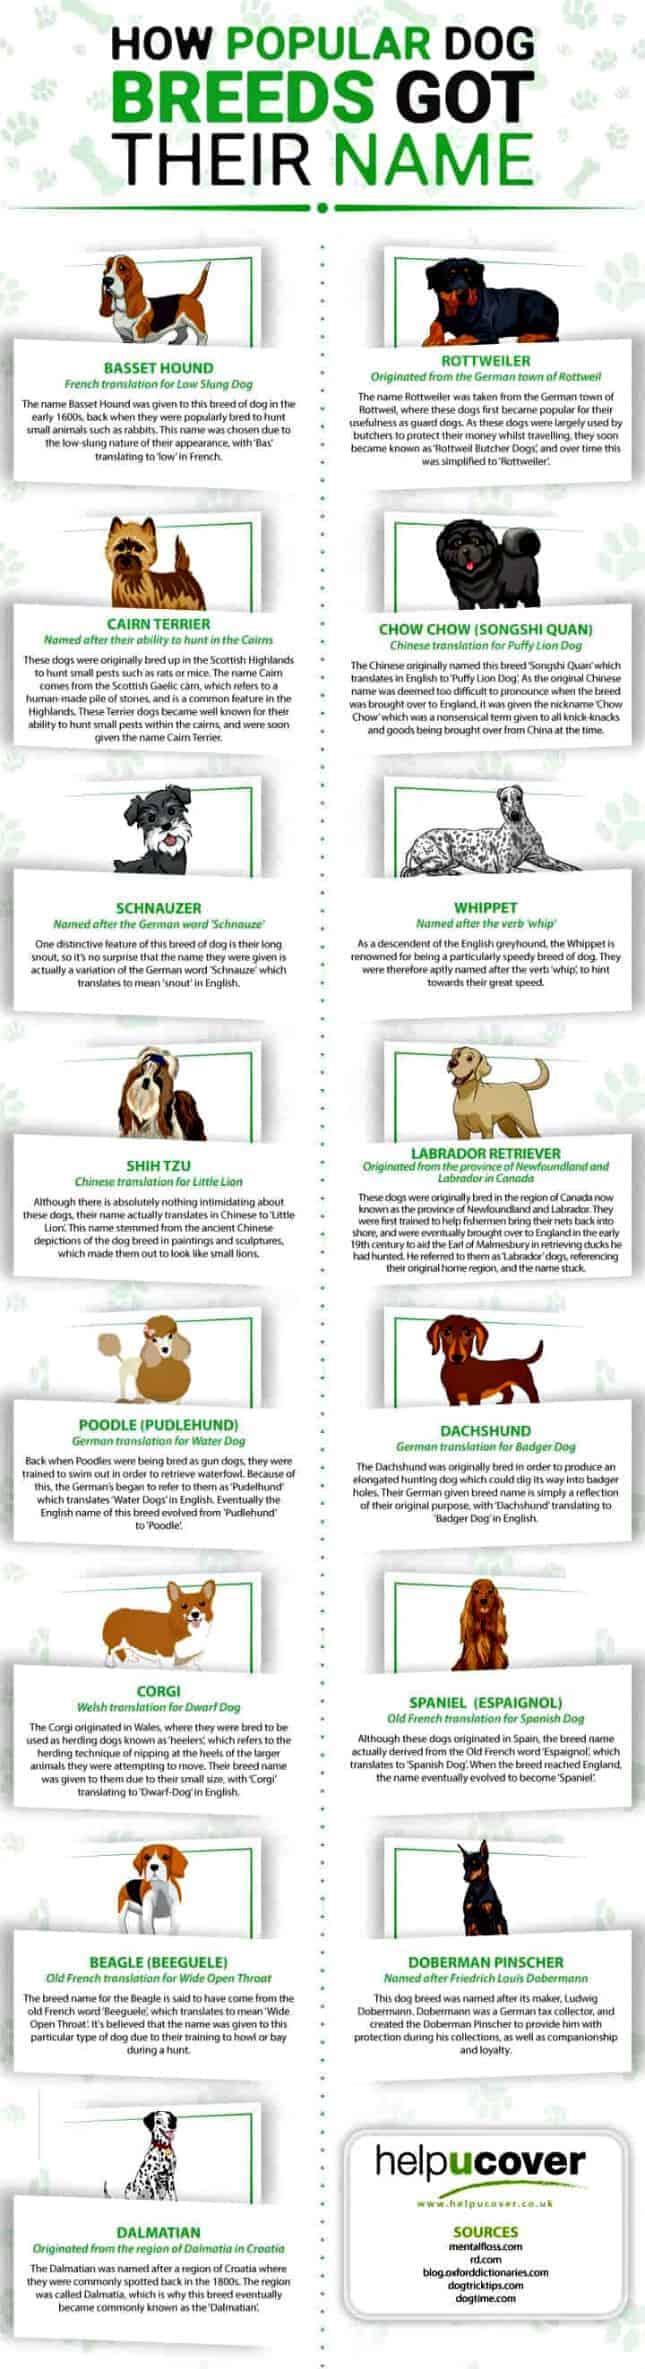 dog breed names